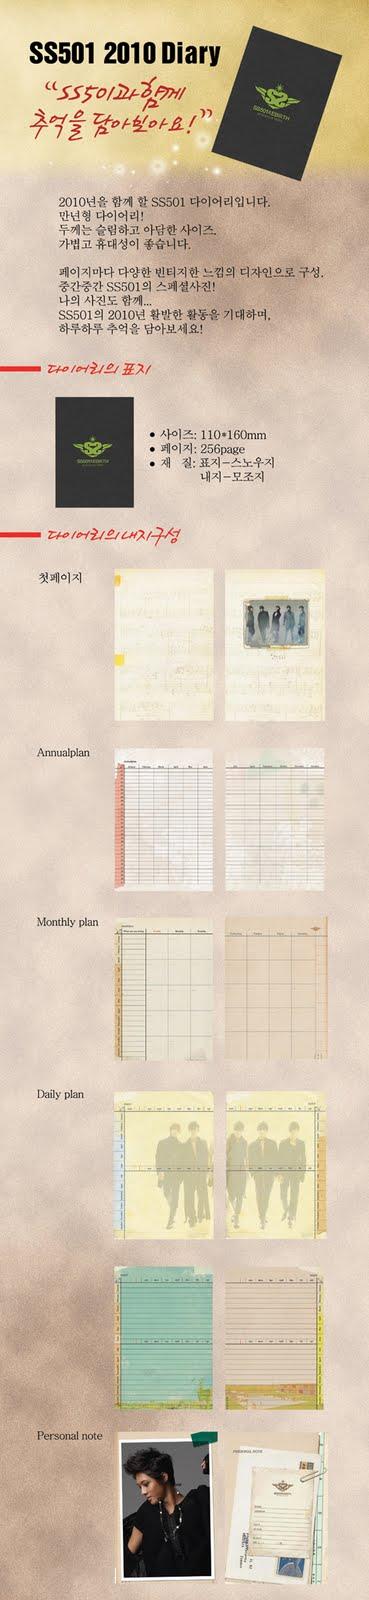 [diary.jpg]